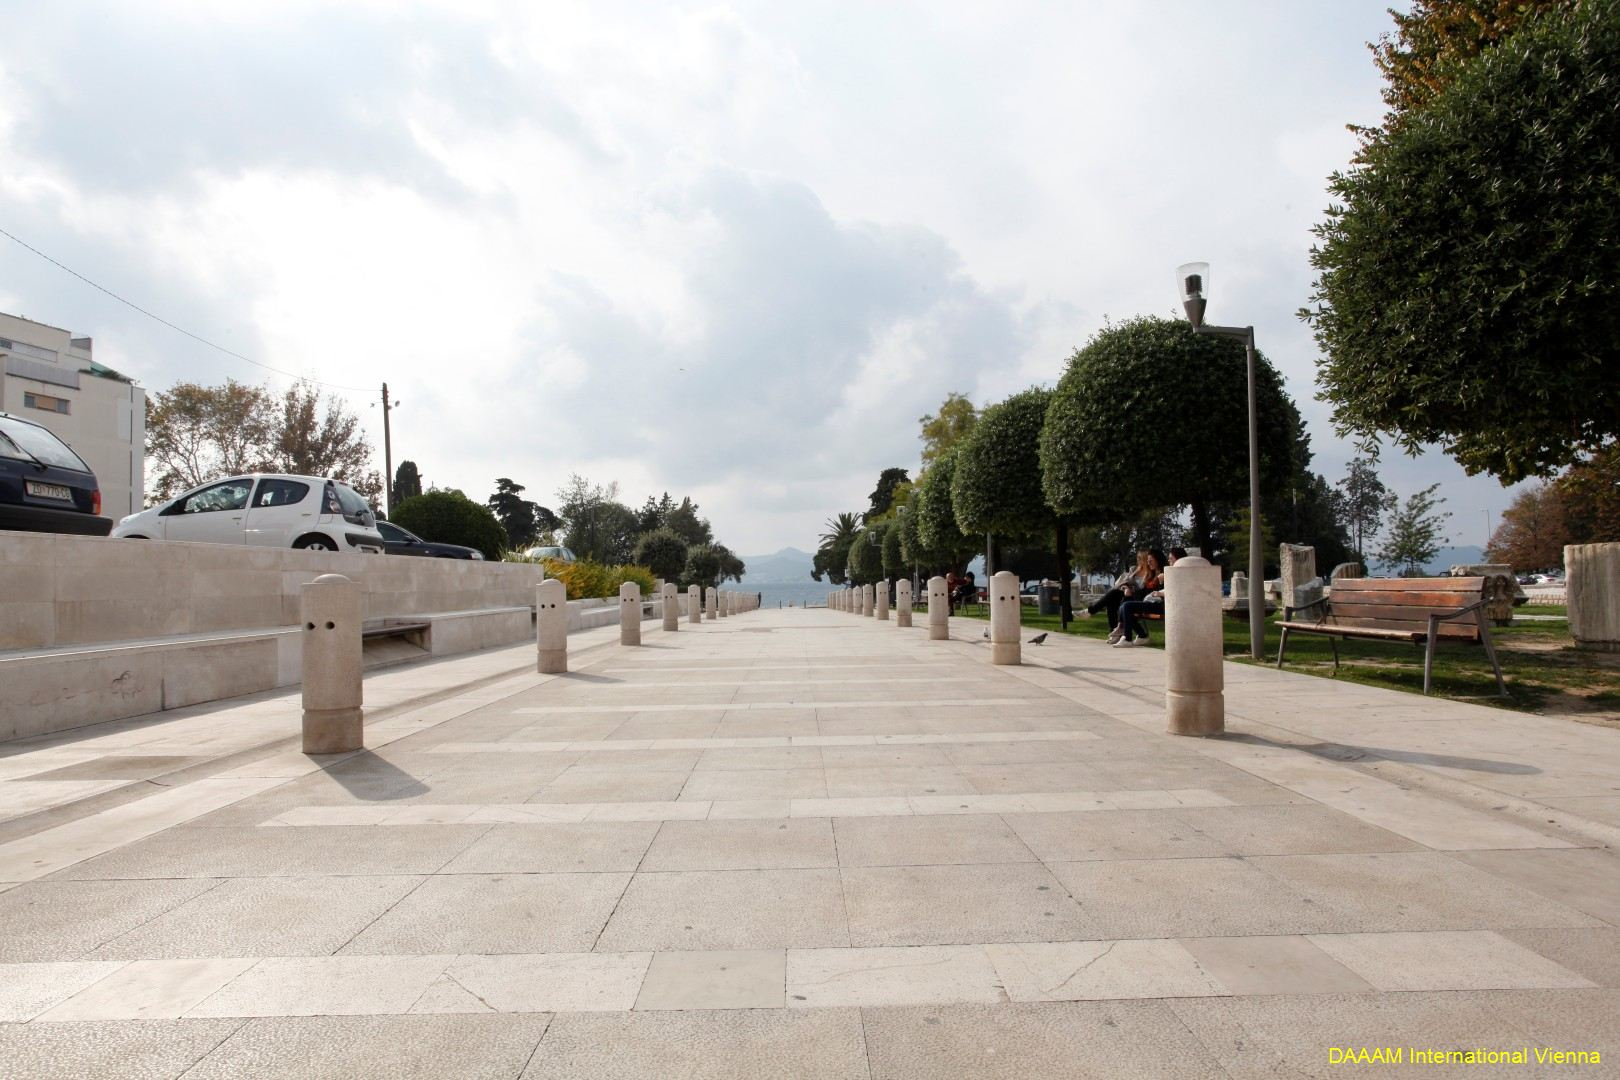 DAAAM_2012_Zadar_00_Zadar_City_070